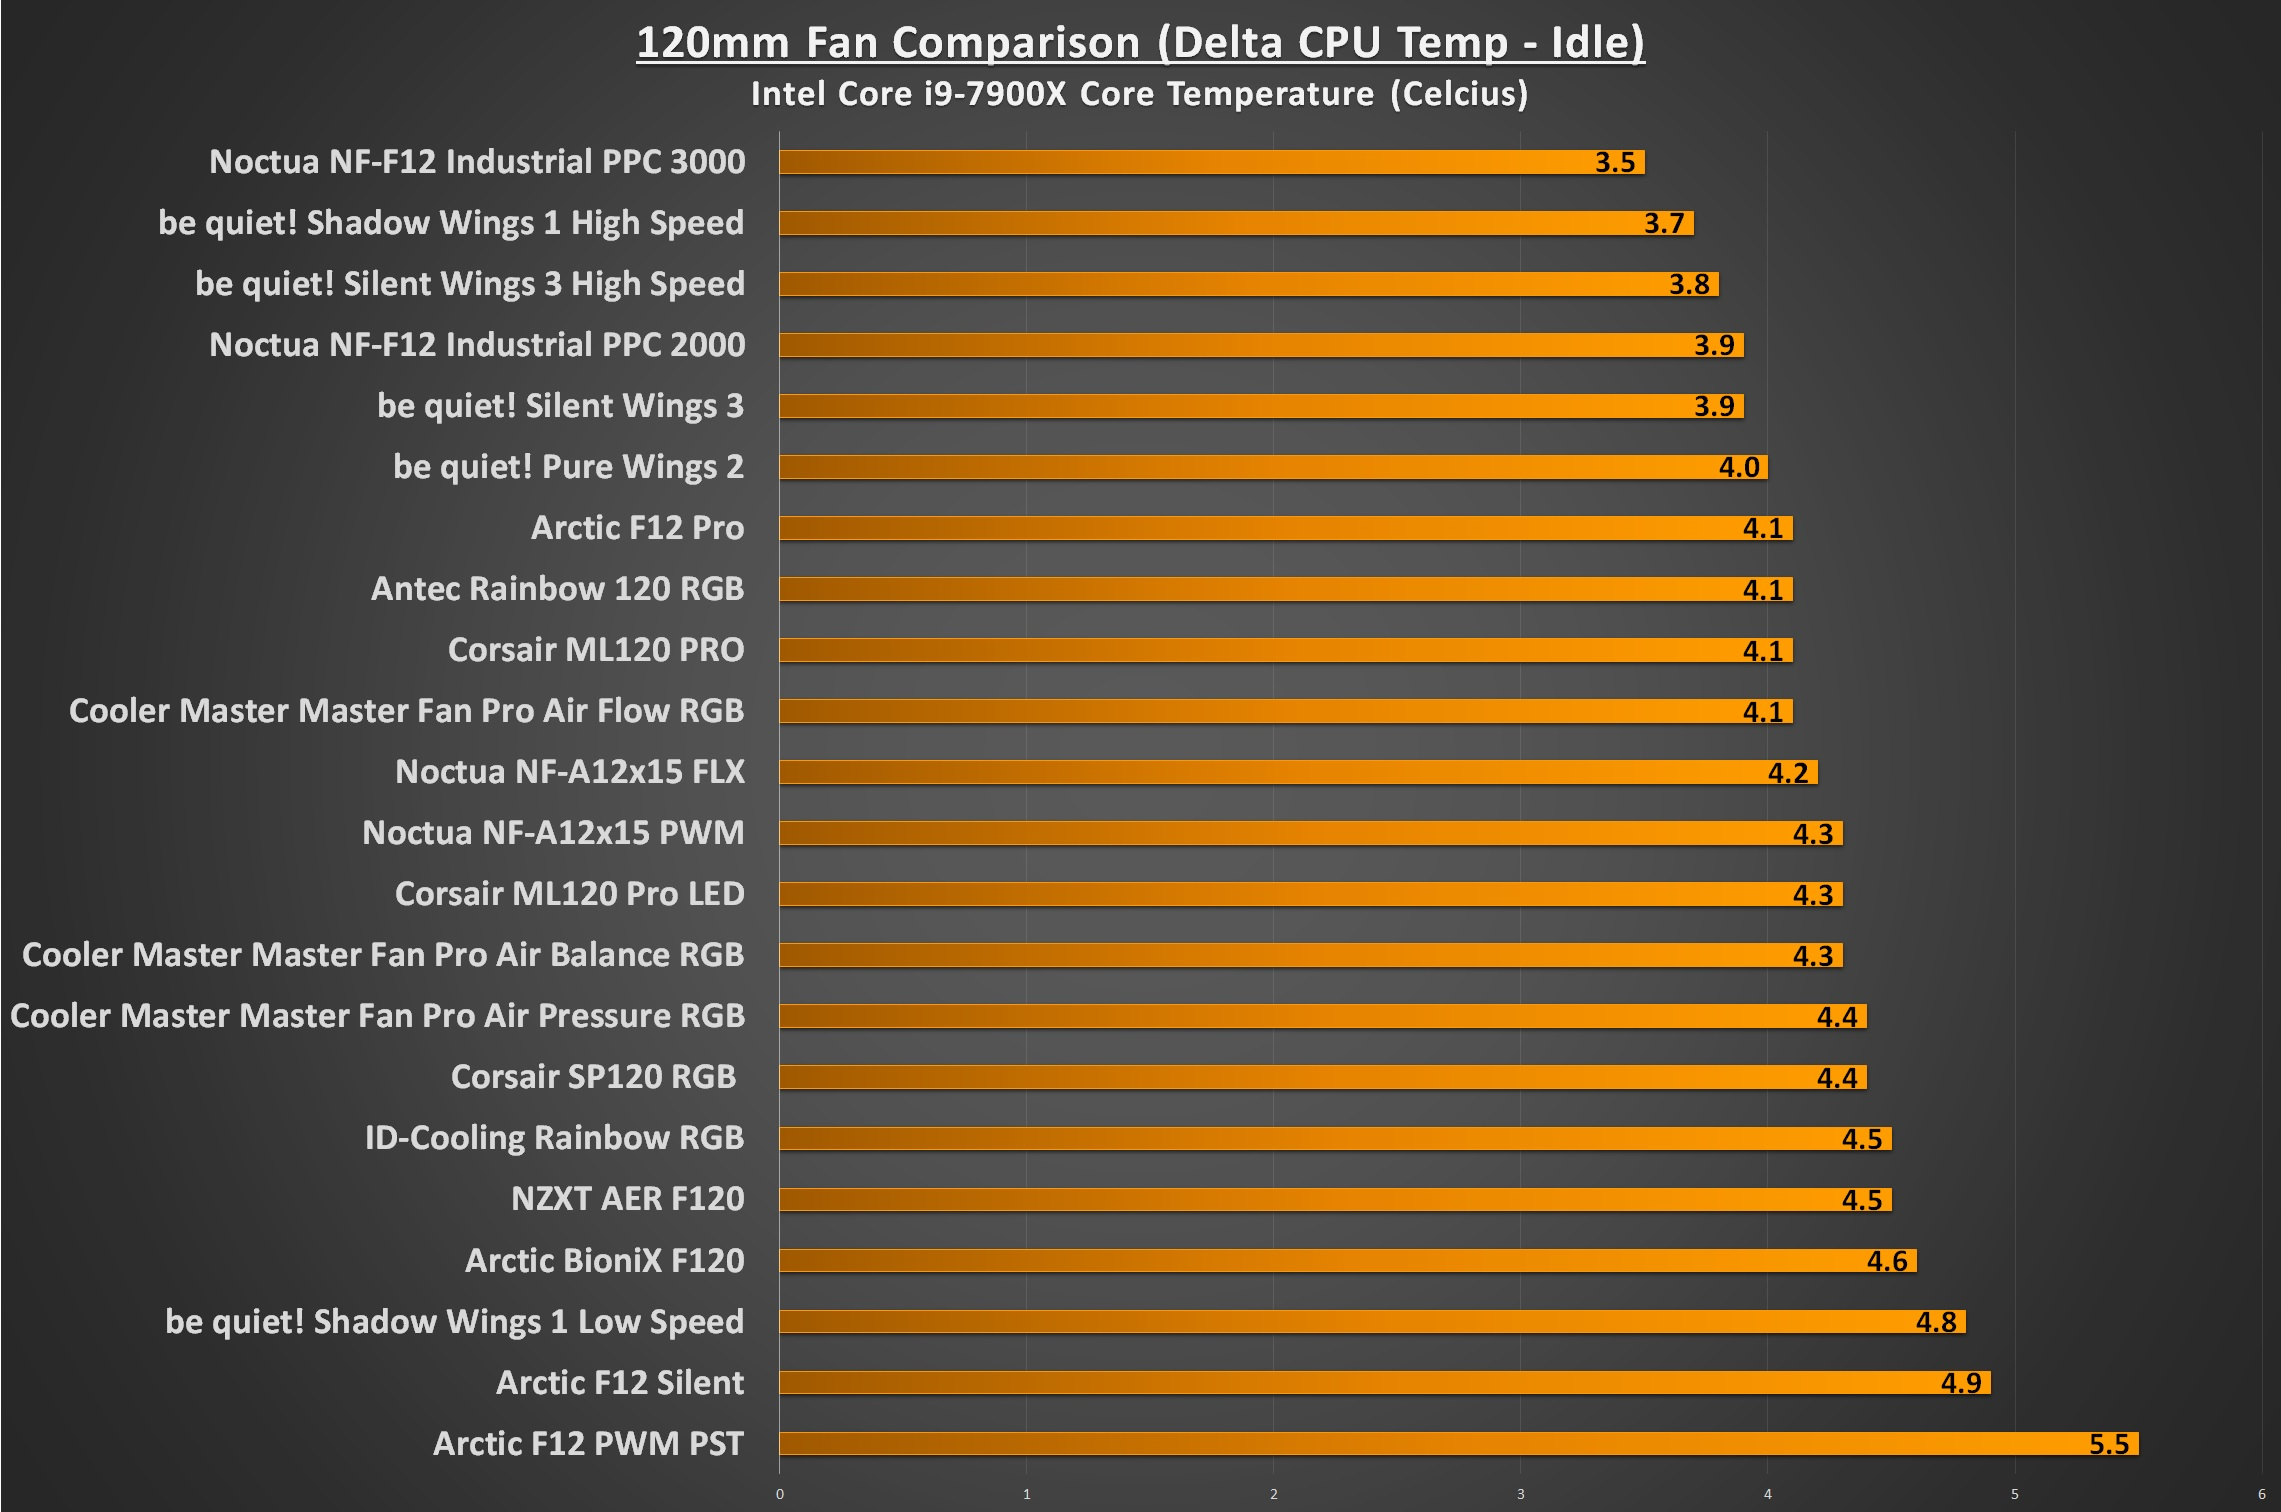 What's The Best 120mm Case Fan For Your PC? - 120mm Fan Comparison